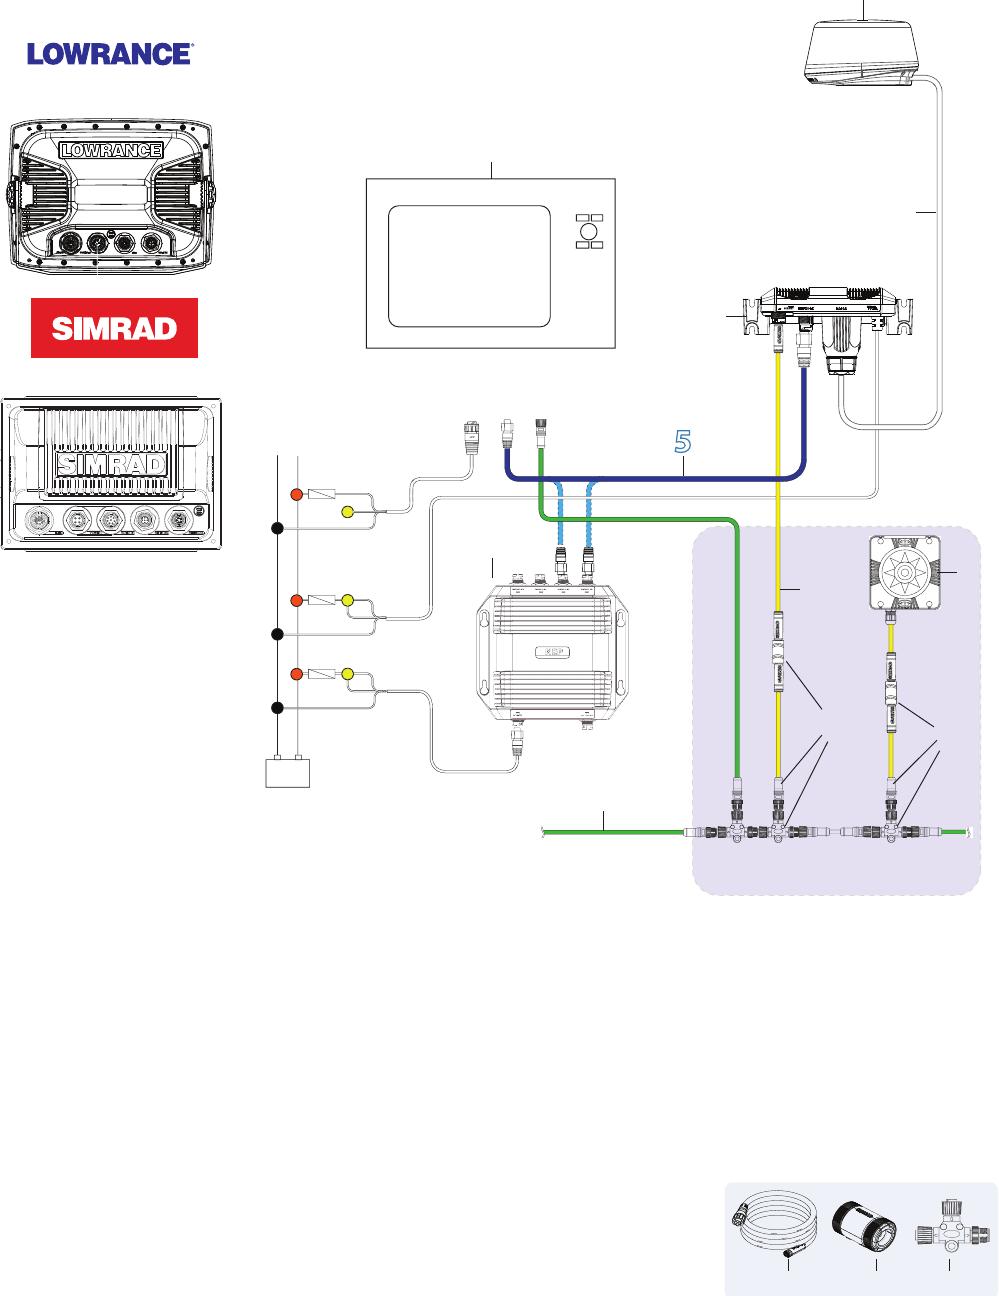 medium resolution of wiring network a simrad